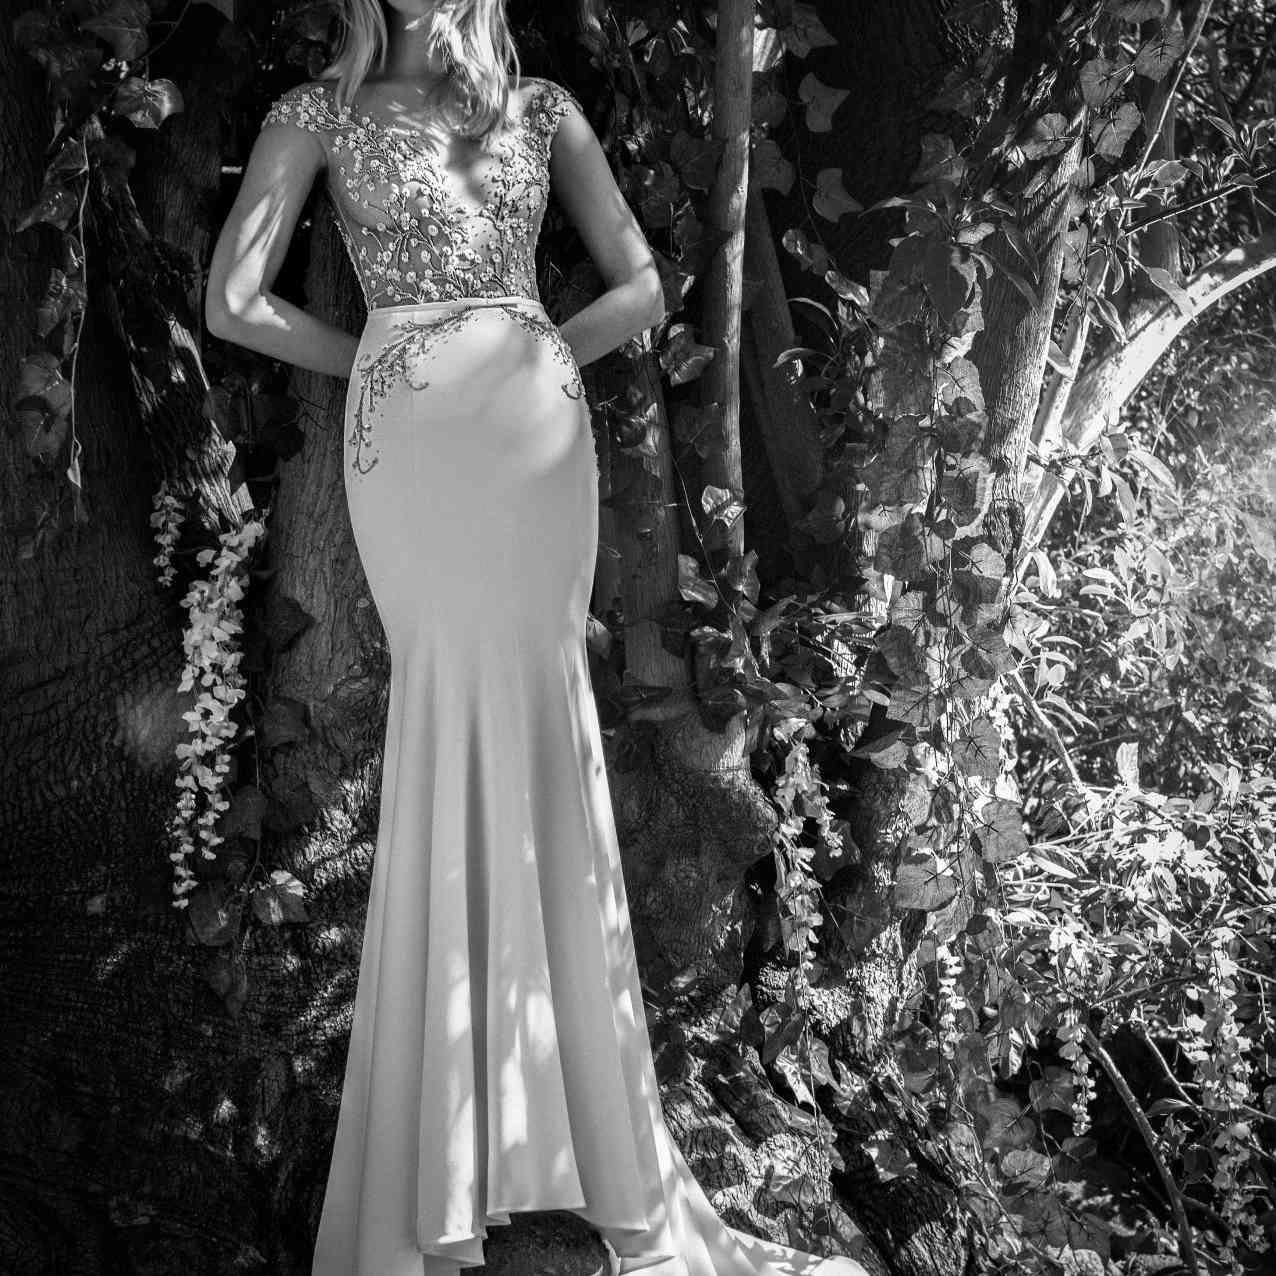 Charlie mermaid wedding dress